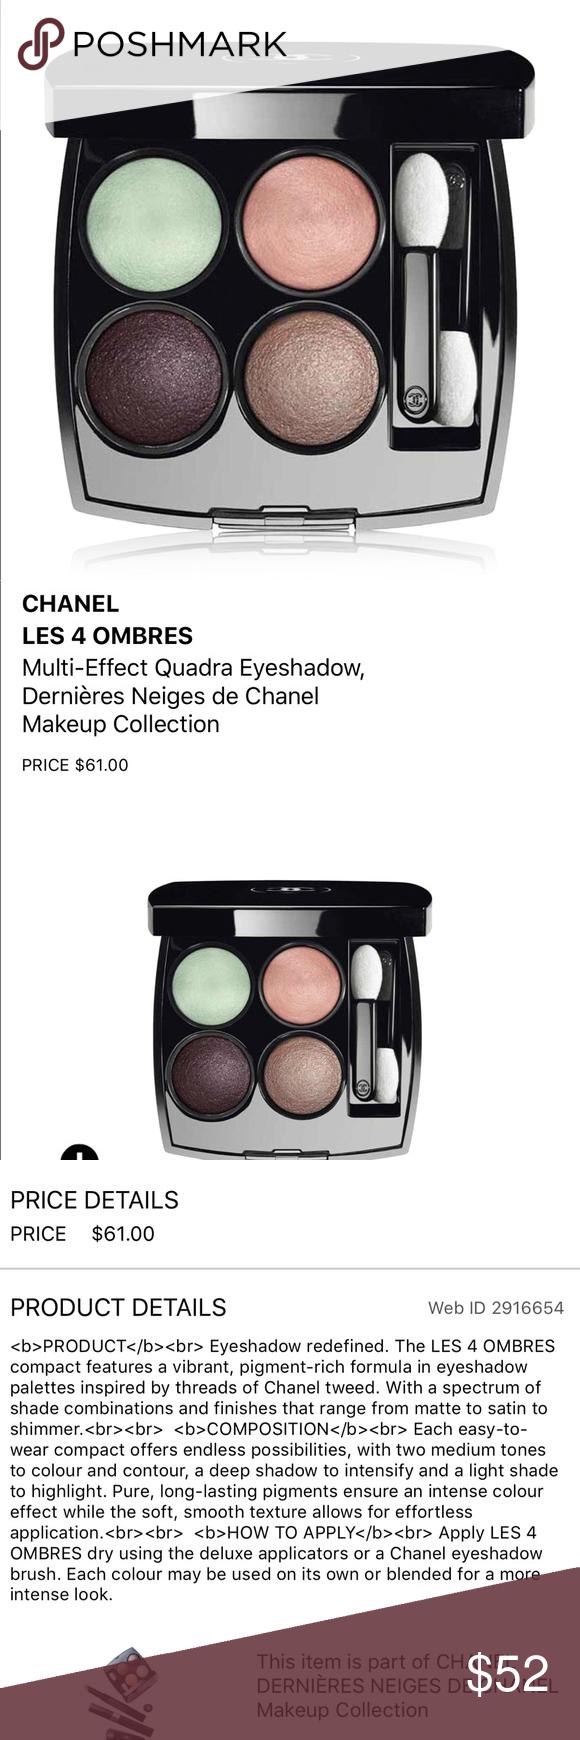 NEW Chanel Eyeshadow Chanel eyeshadow, Eyeshadow